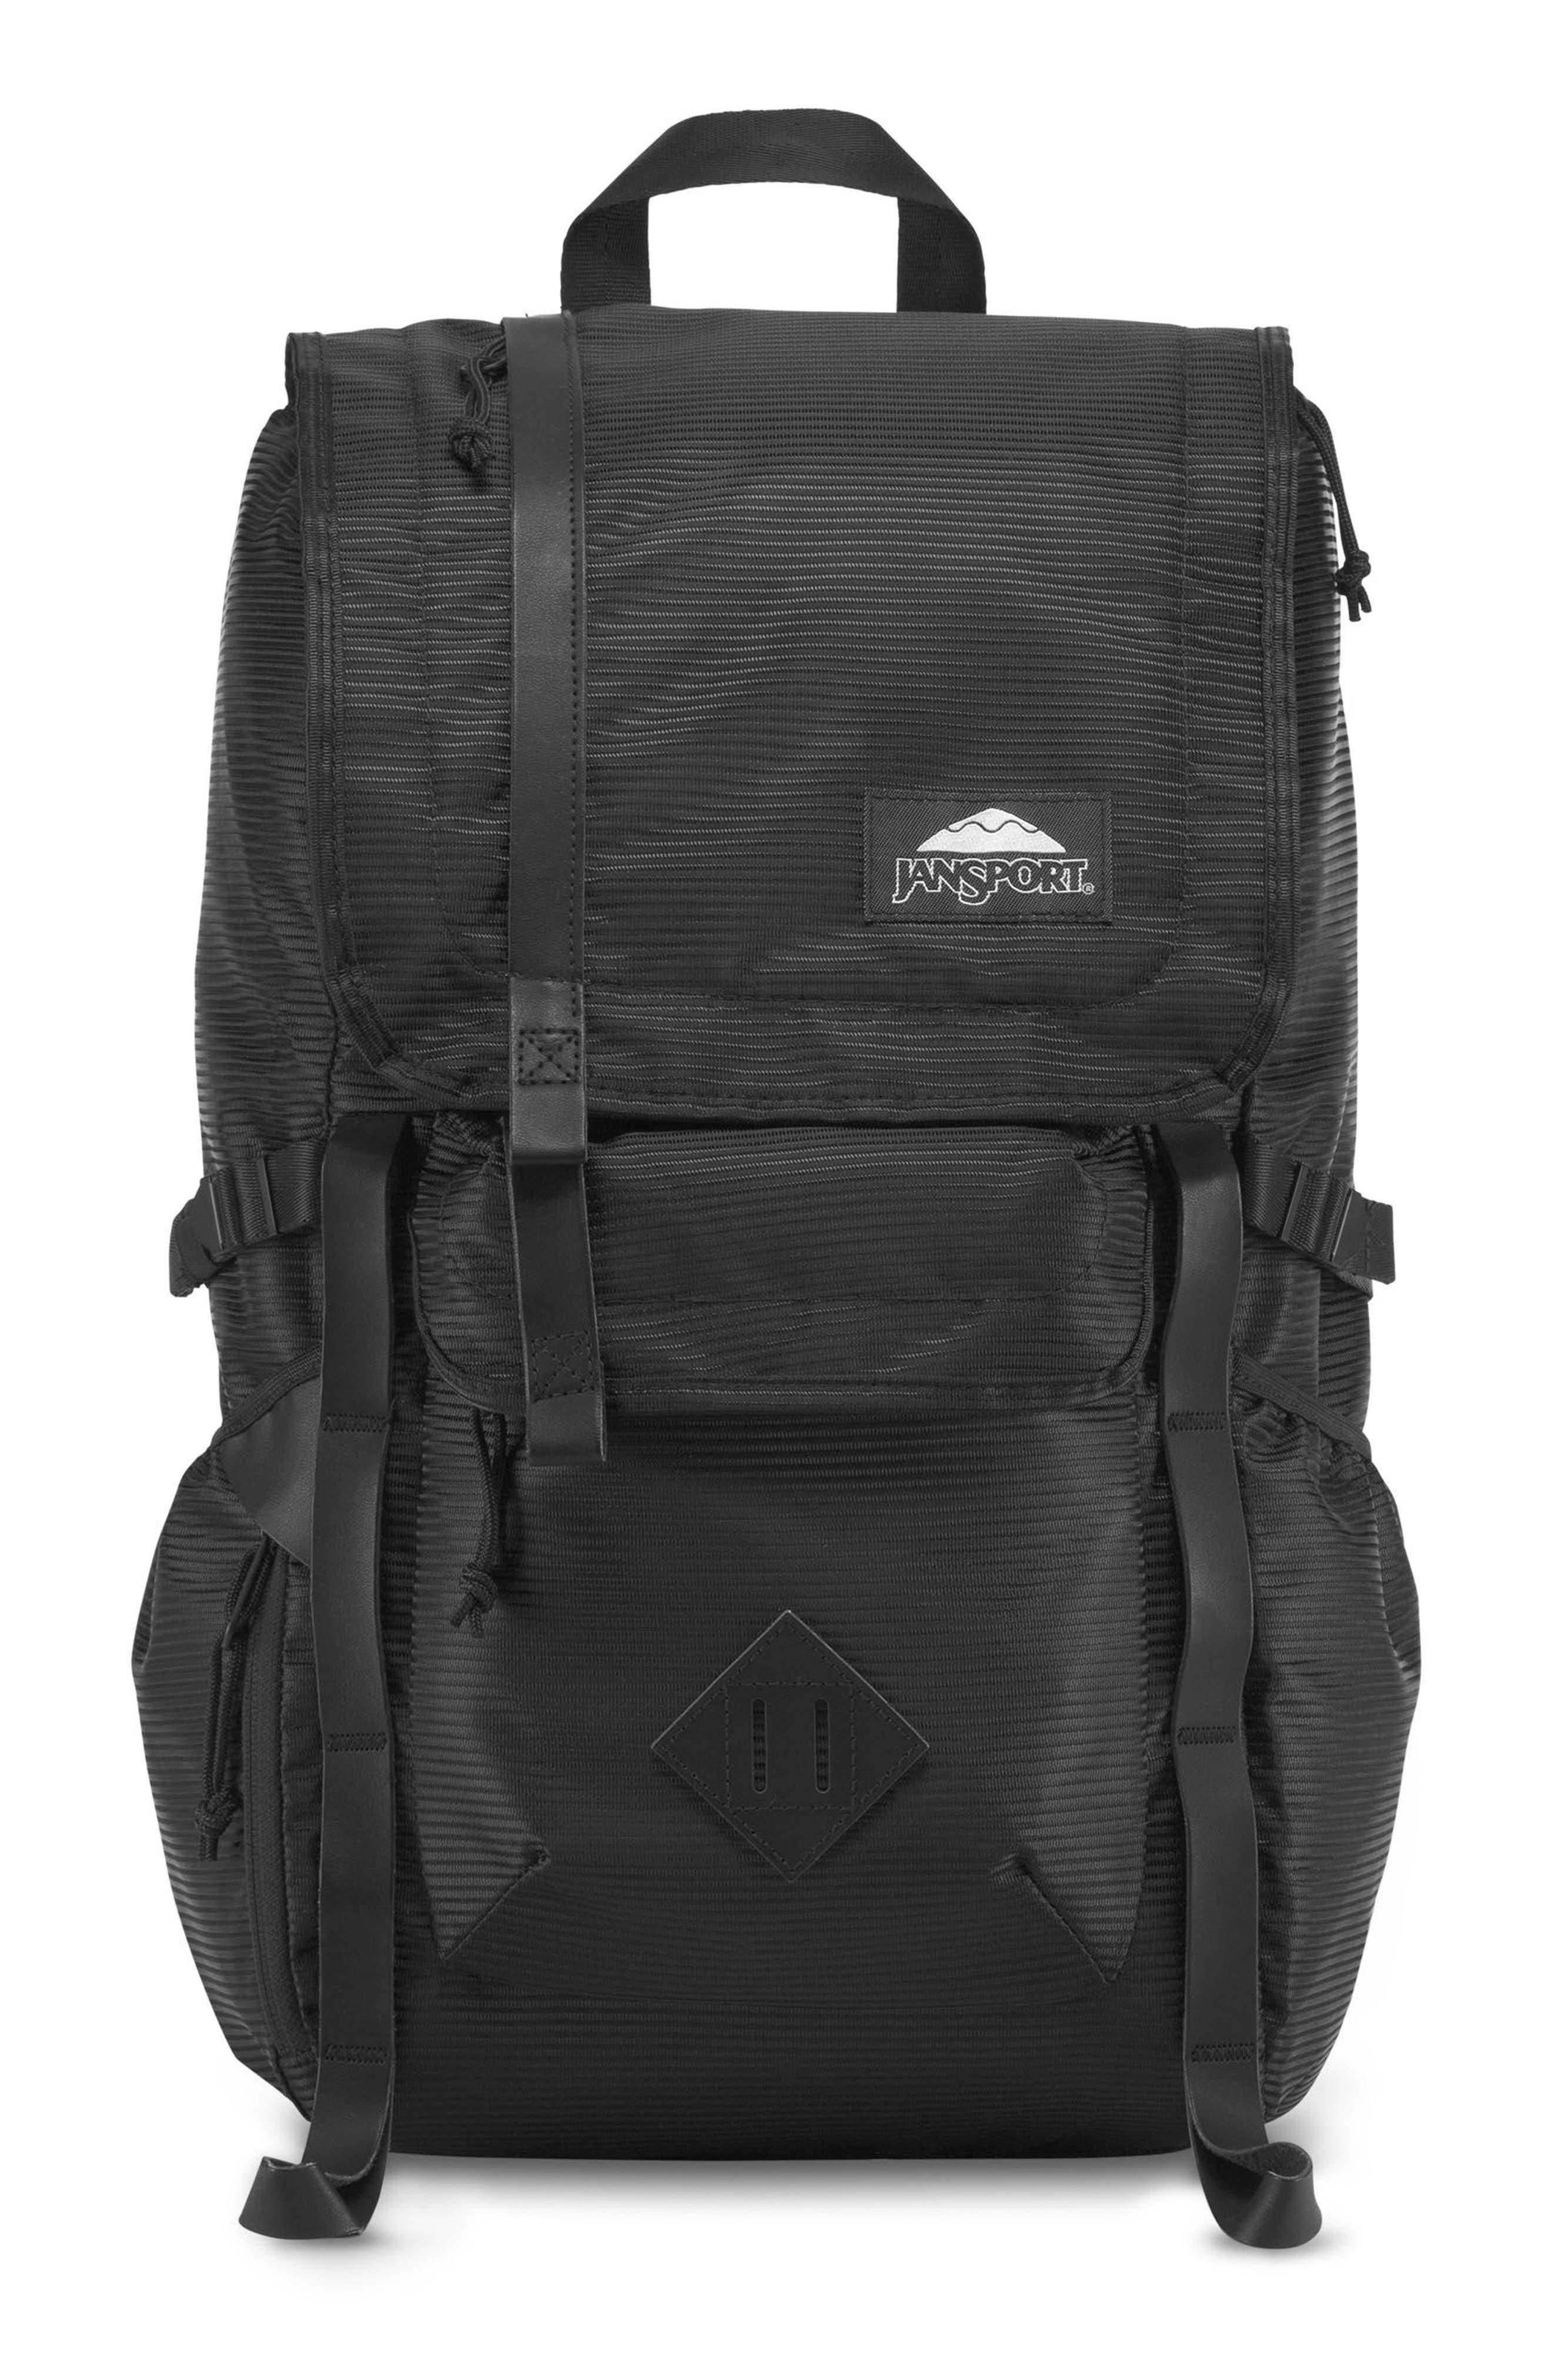 Hatchet DL Backpack,                             Main thumbnail 1, color,                             001